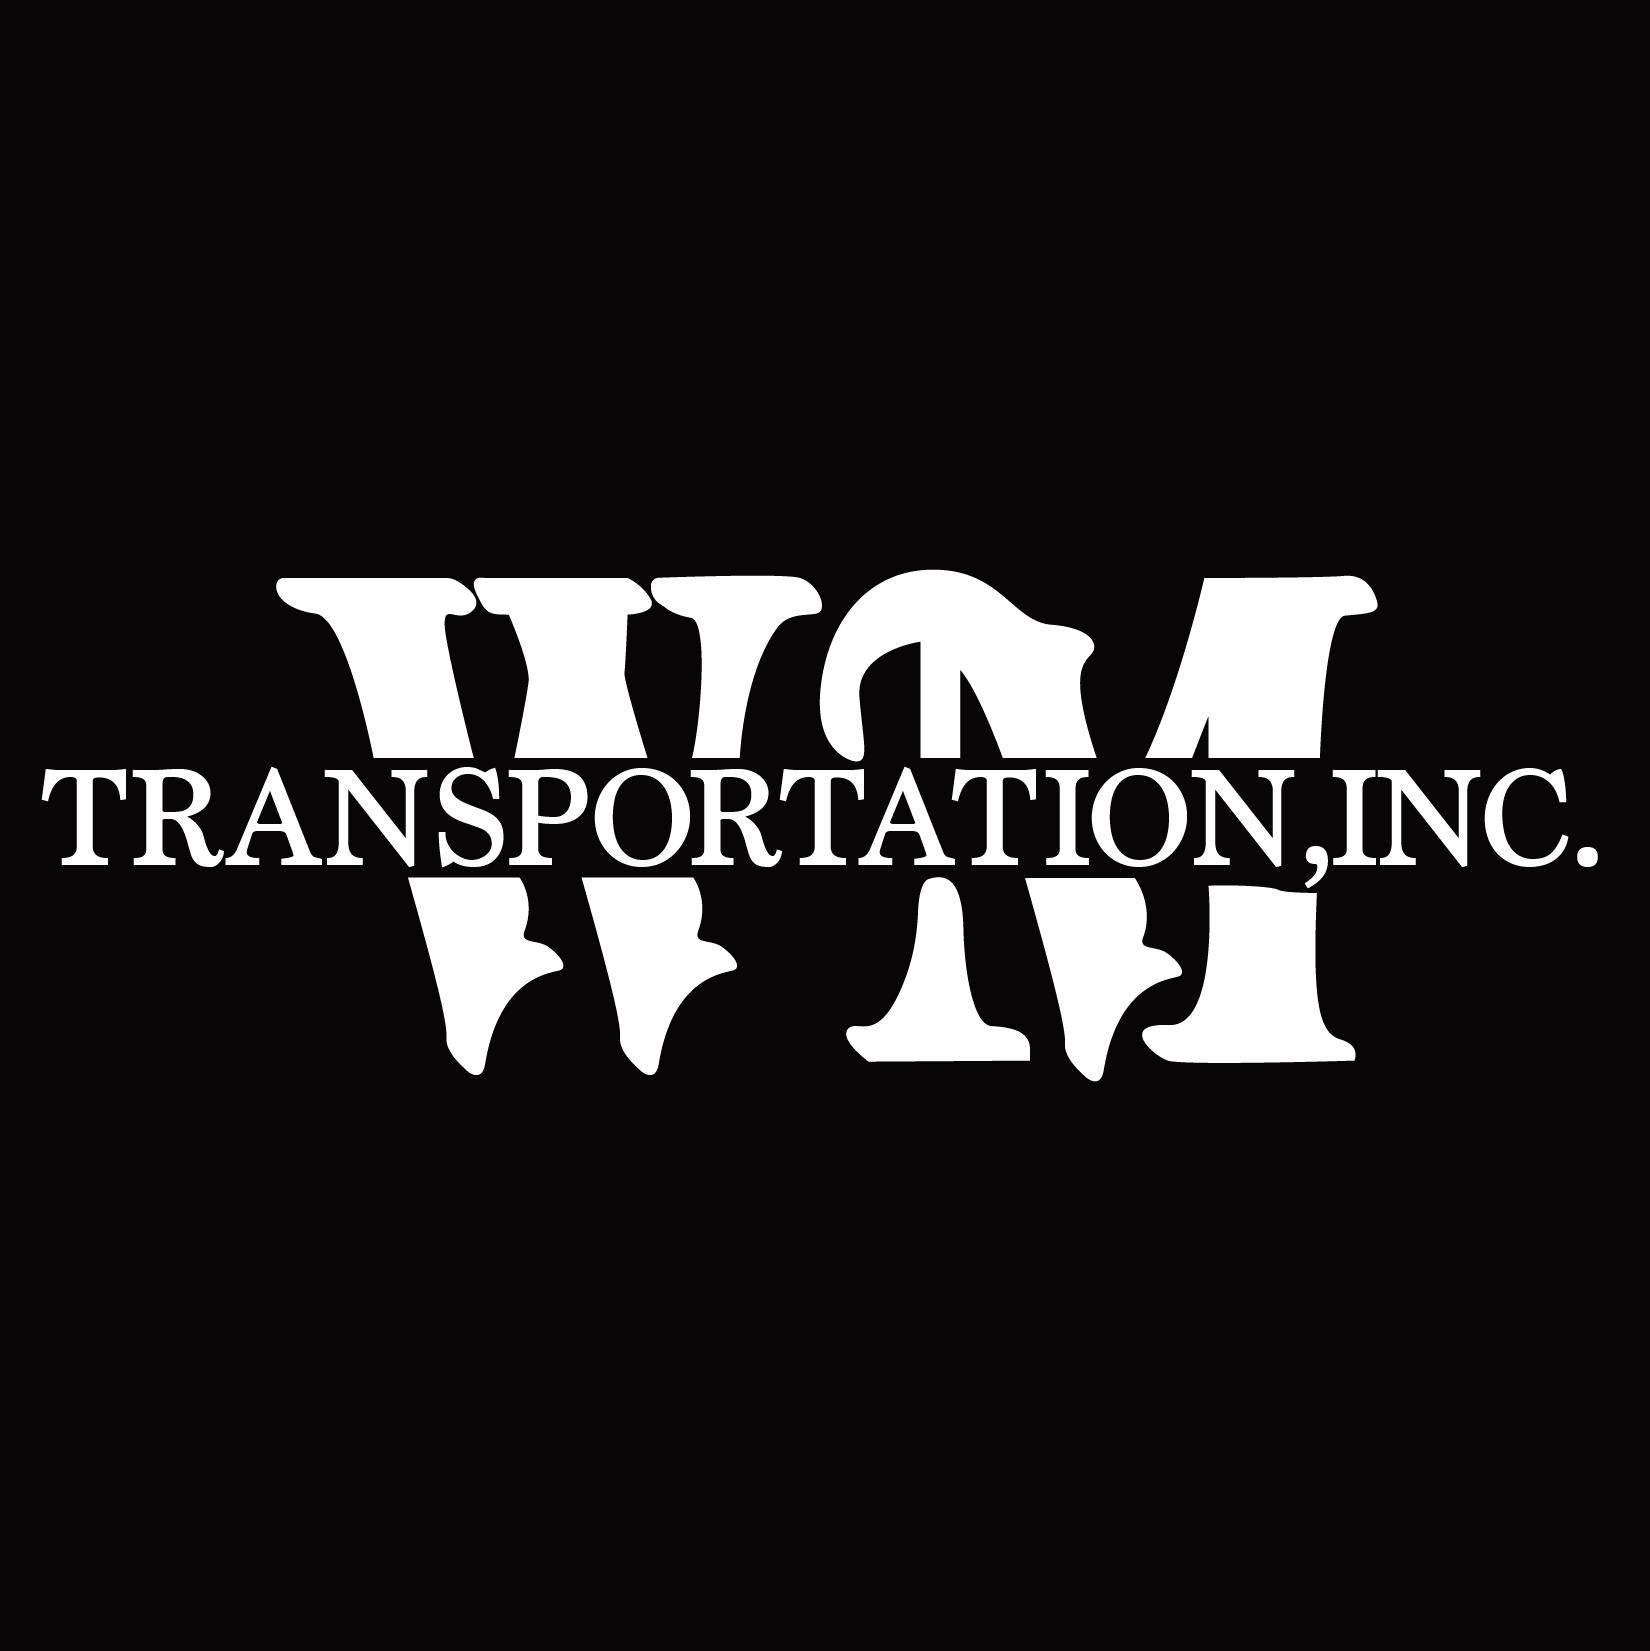 WM Transportation